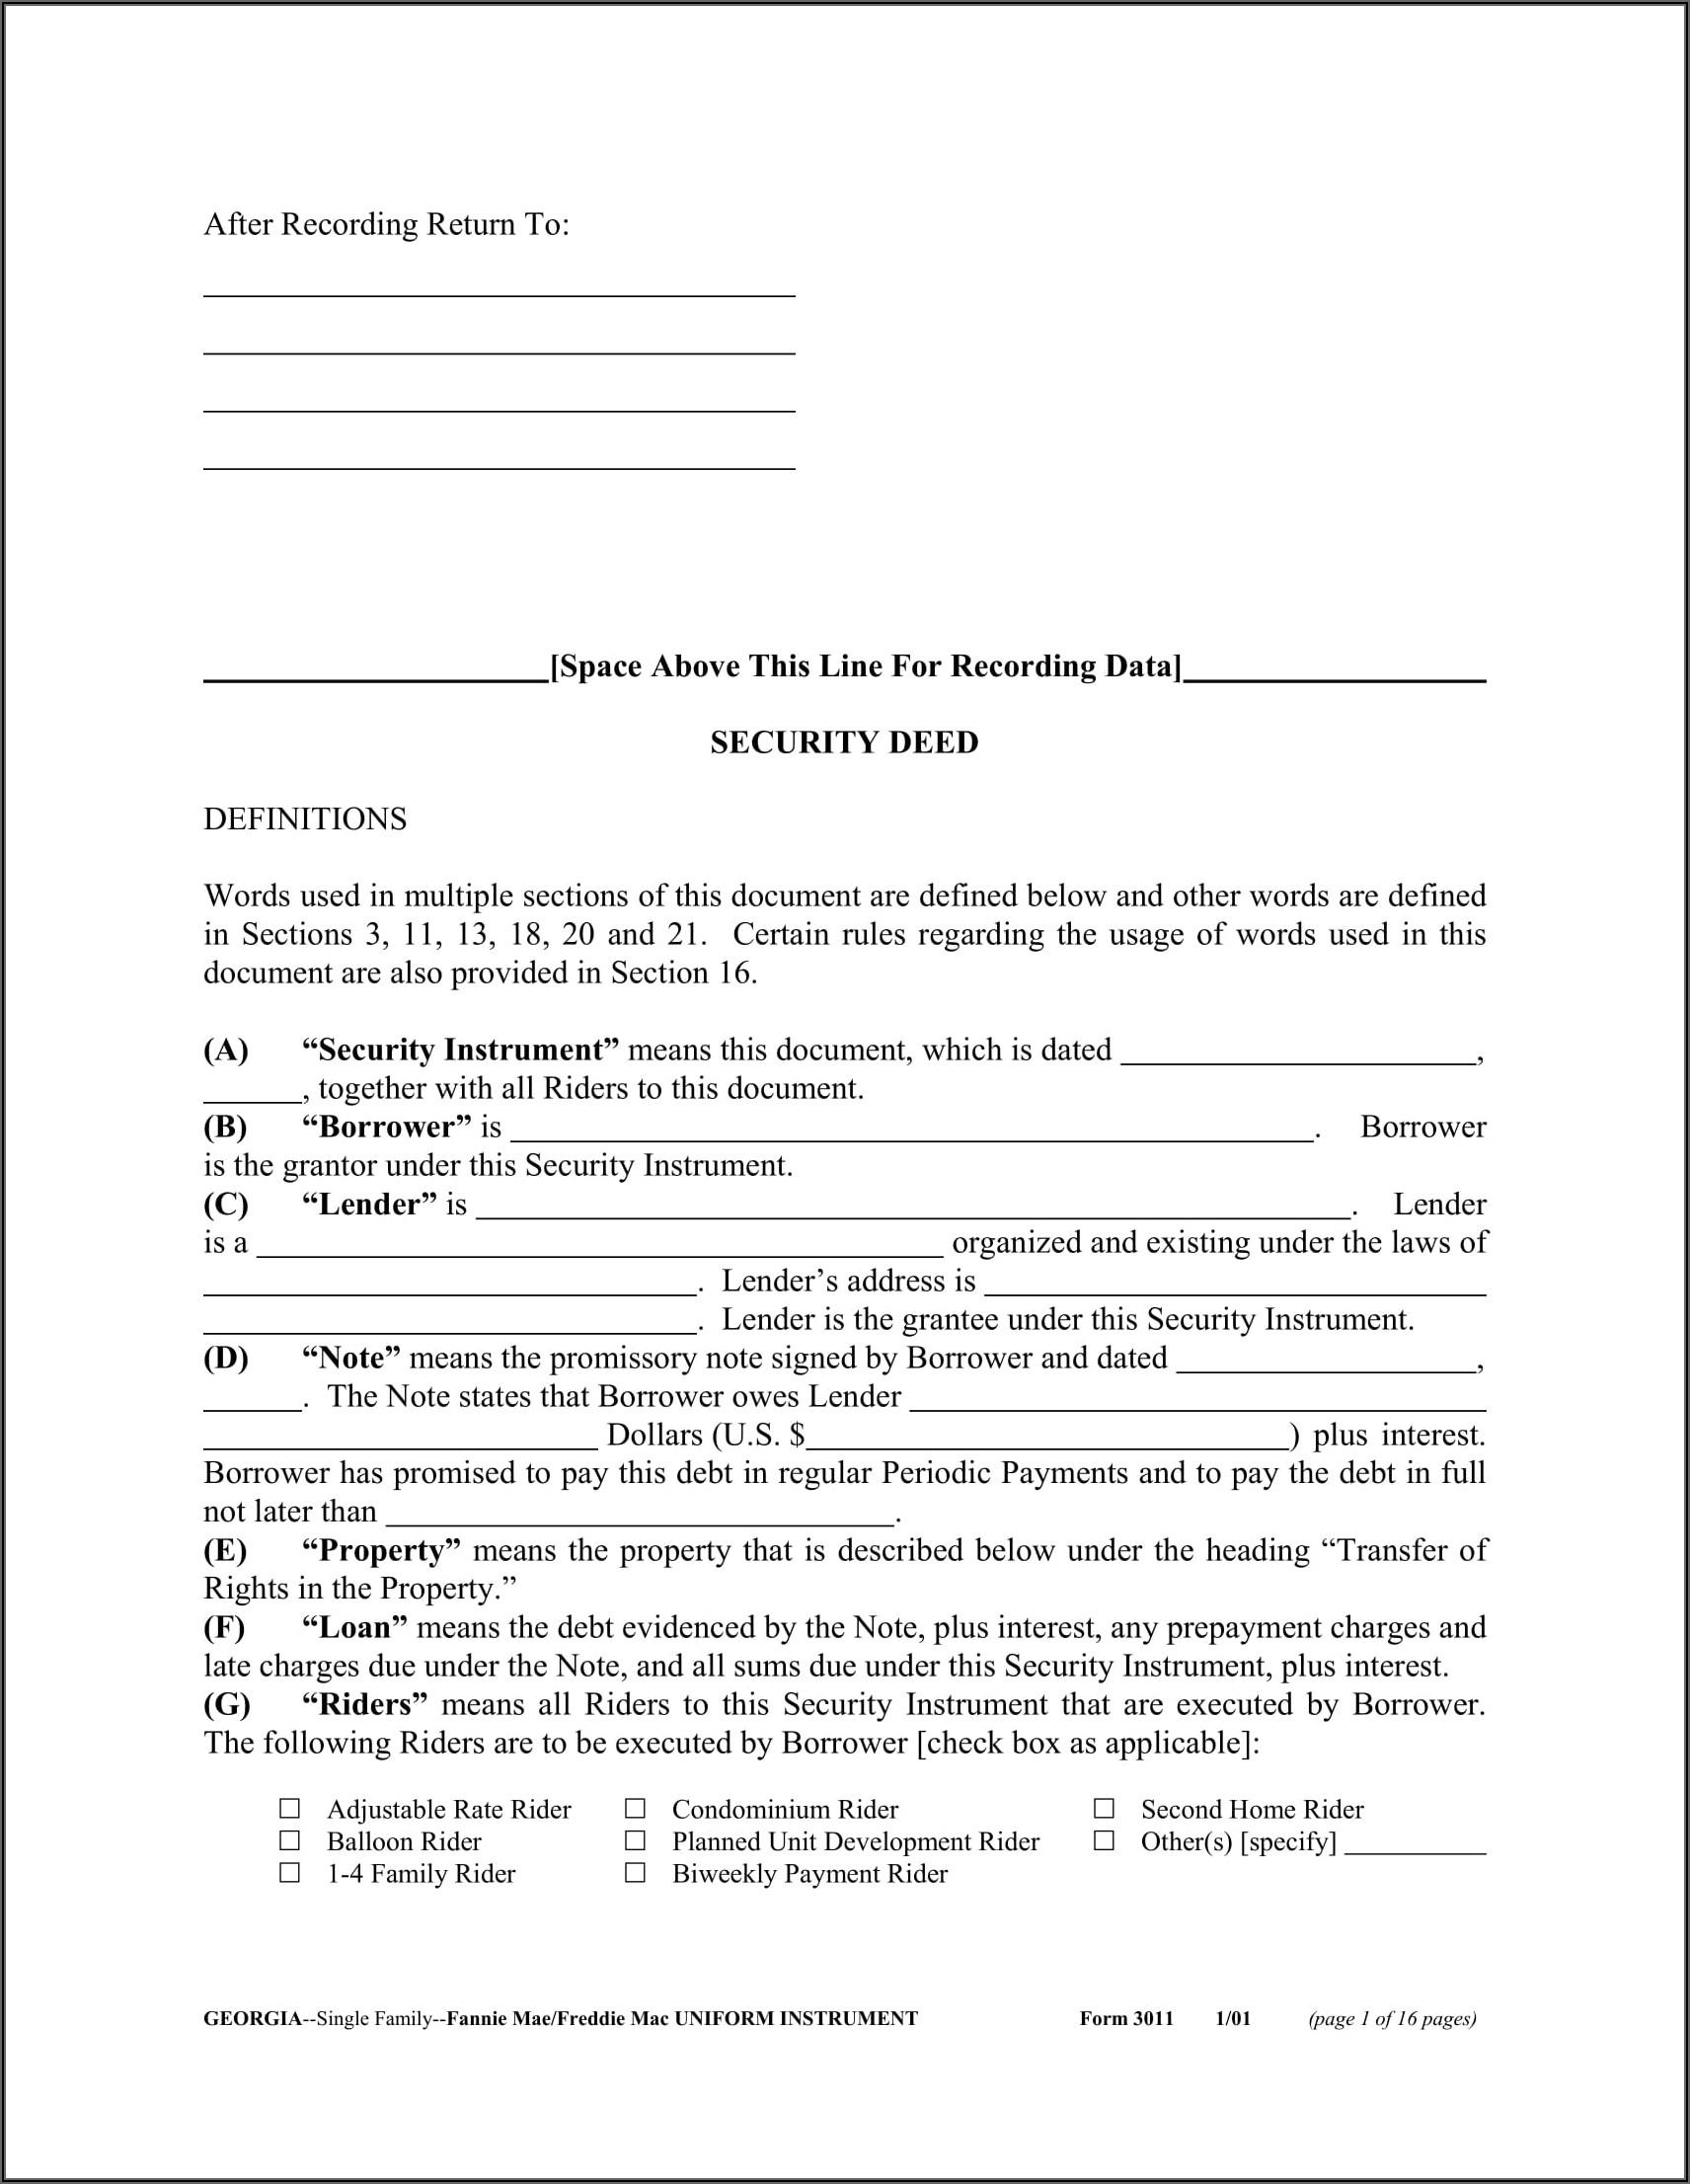 Georgia Executor's Deed Form